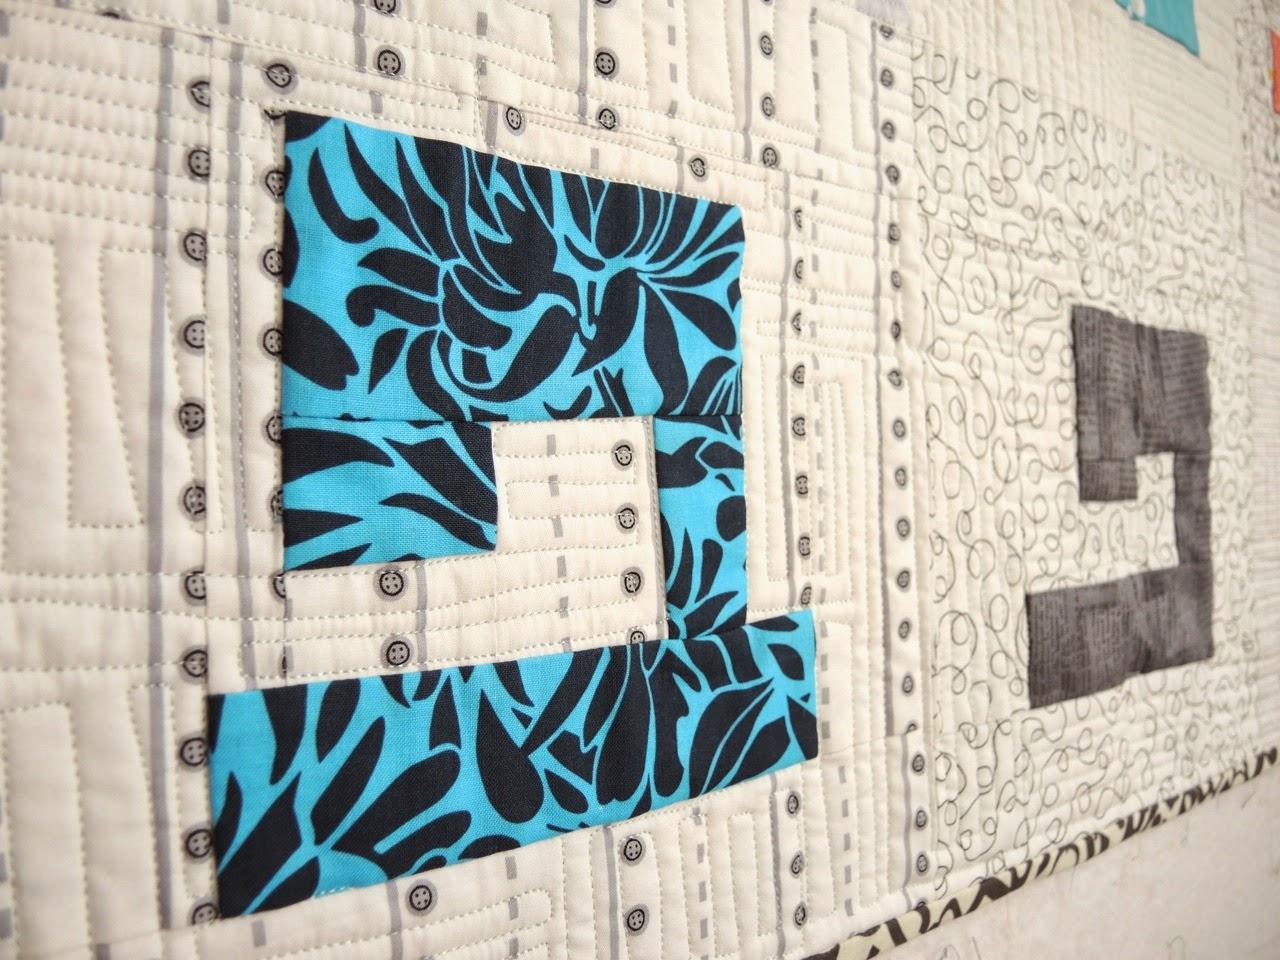 sewing+machine+quilt+final+3.jpg